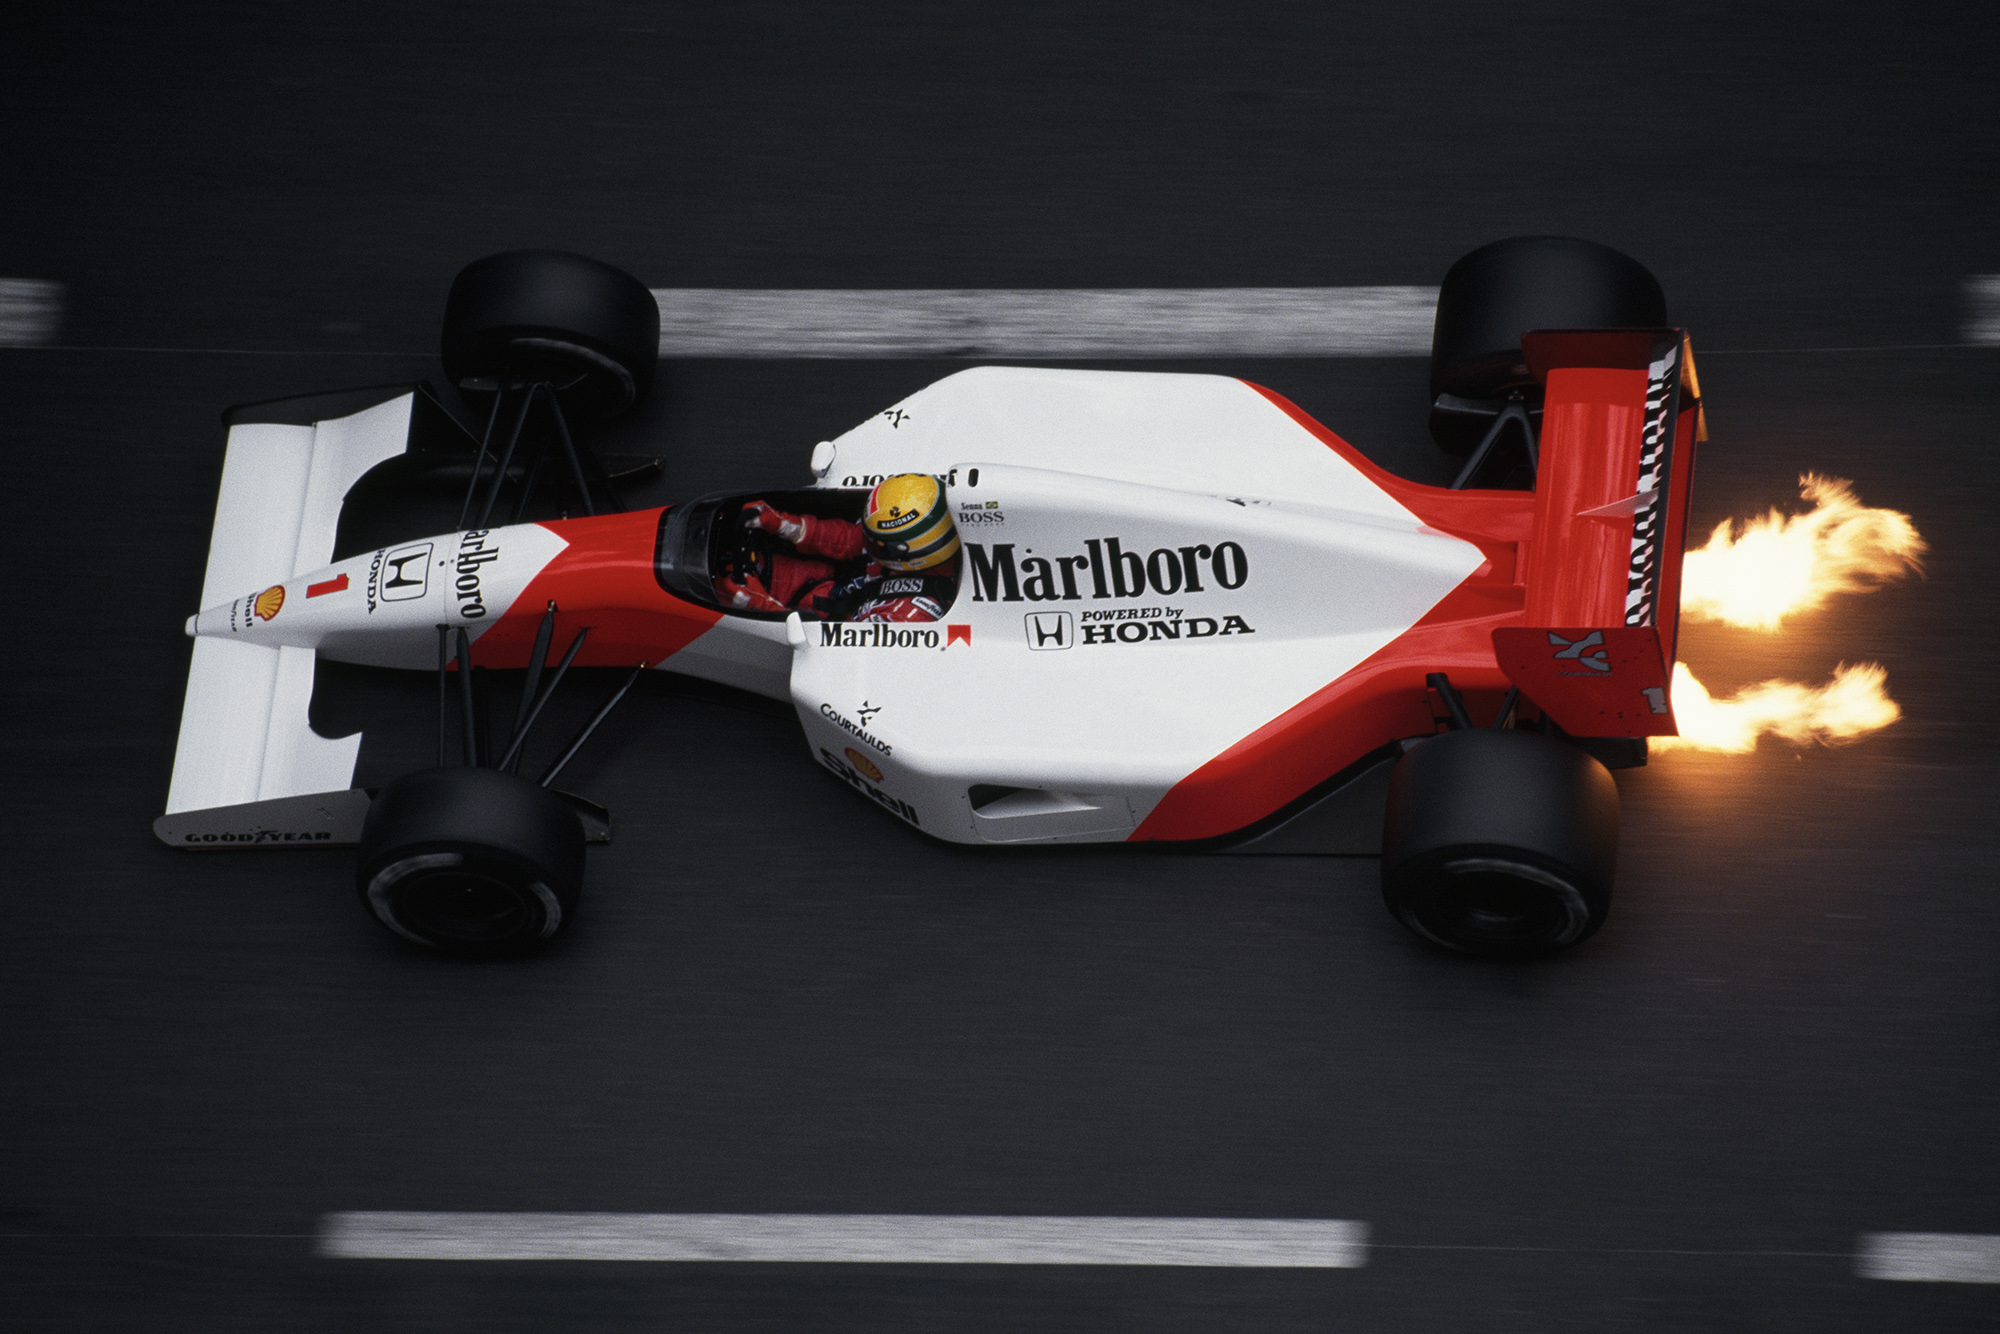 Flames shoot from underneath Ayrton Senna's McLaren Honda at the 1991 Monaco Grand Prix